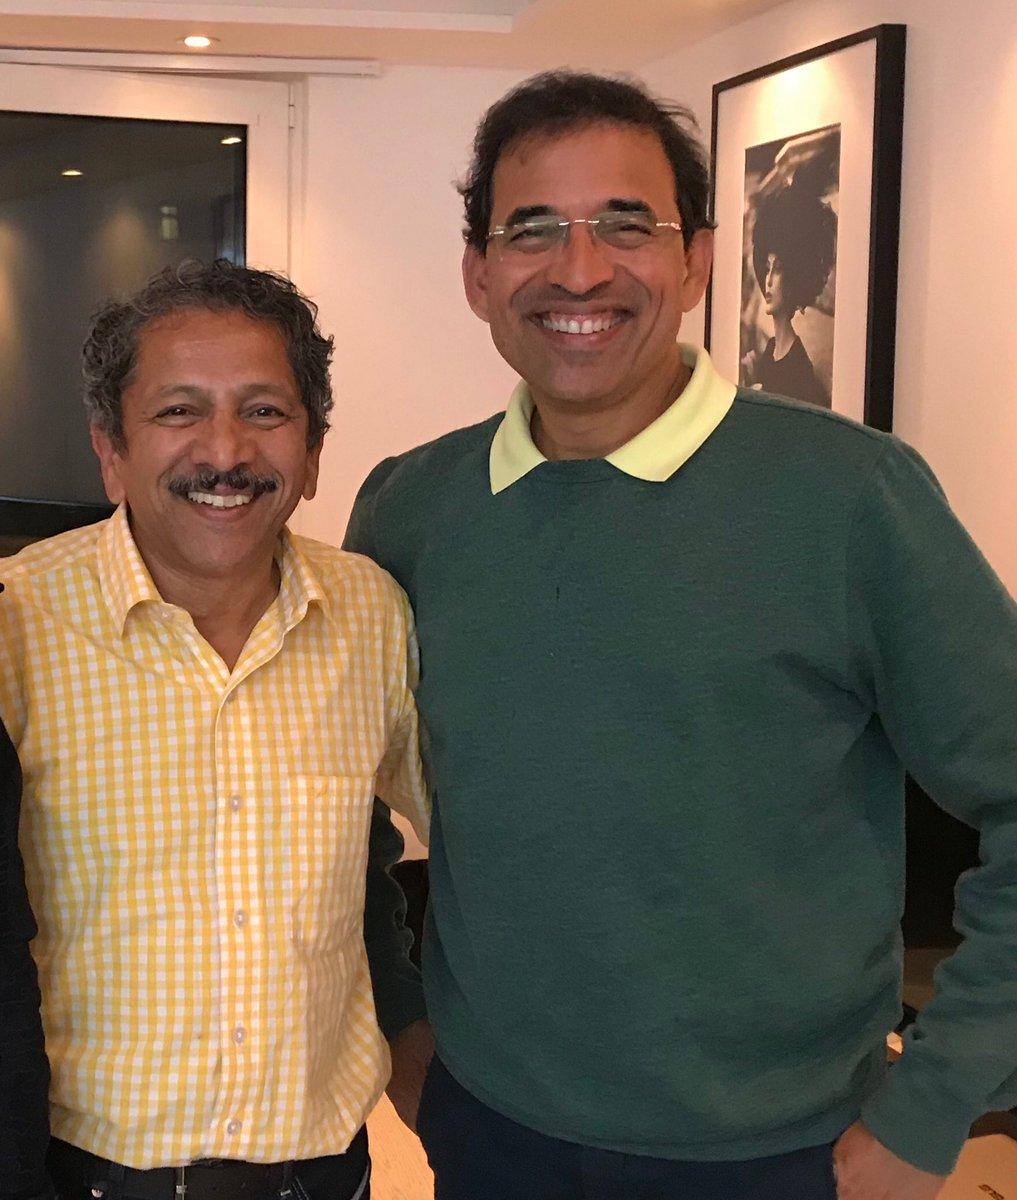 Happy birthday to dear friend mentor and मस्त माणुस @bhogleharsha<br>http://pic.twitter.com/ixPul4WRxN